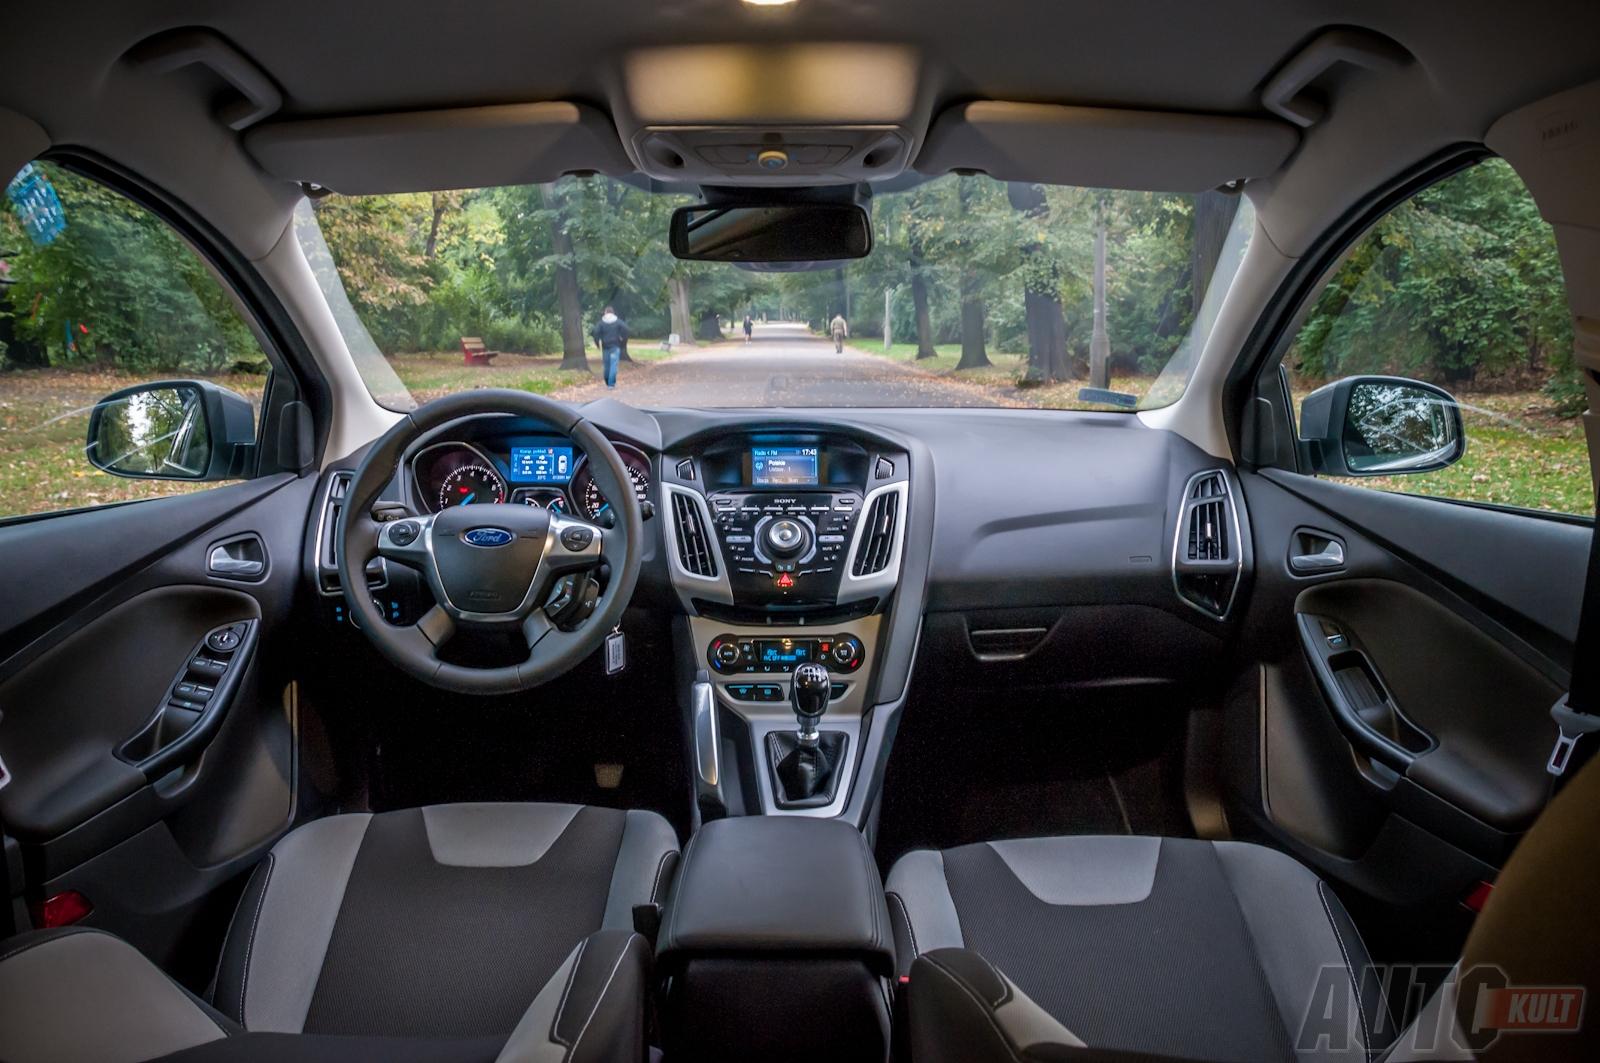 Комплектация Trend / Ford Focus 3 — FFClub